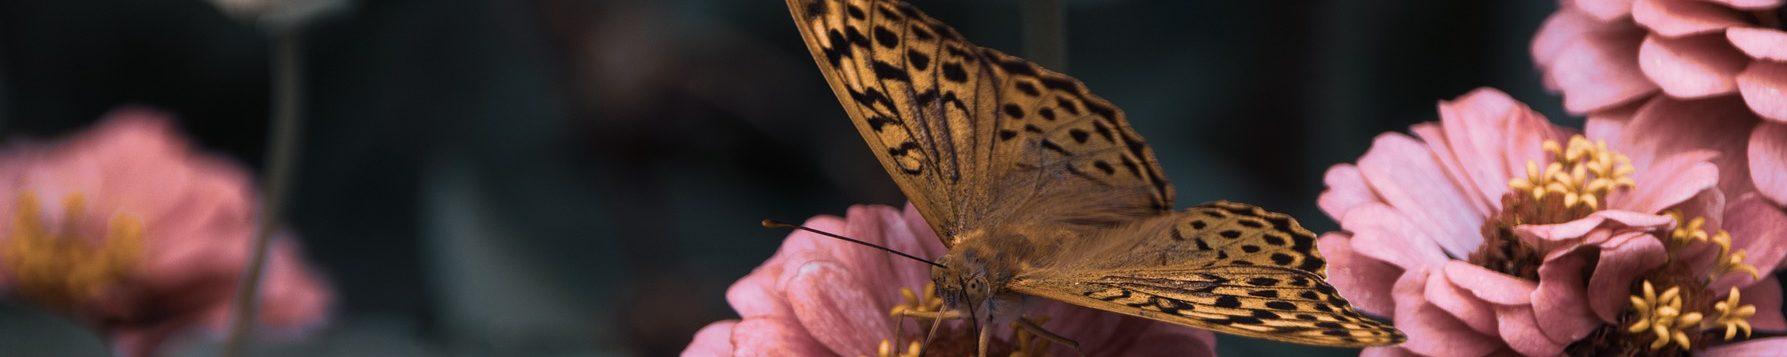 papillon-jaune-fleurs-roses-pixabay-meradis-aspect-ratio-1500x300